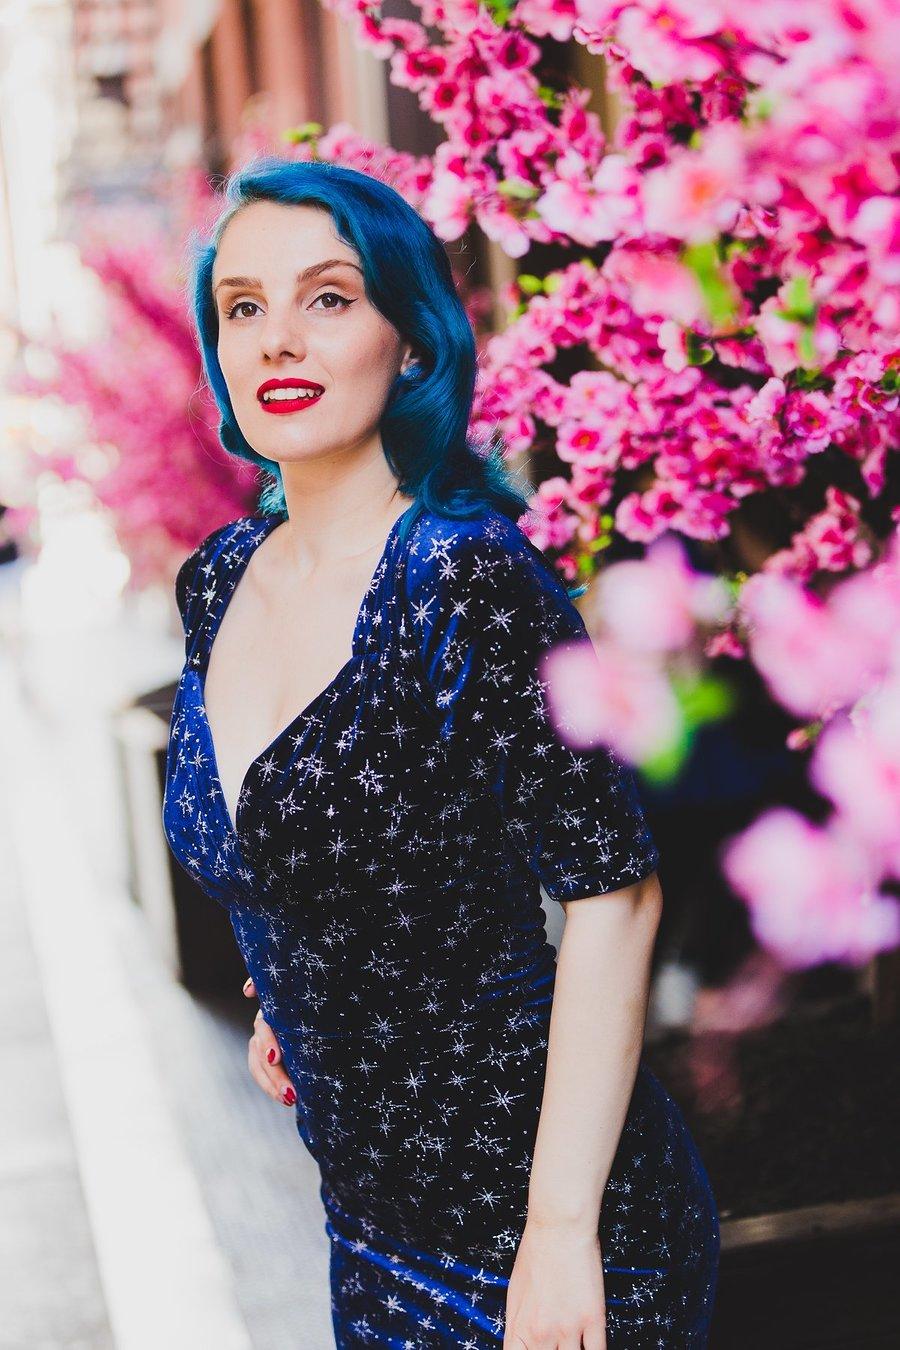 A Morning in New York / Model Mina Von Vixen, Makeup by Mina Von Vixen, Stylist Mina Von Vixen, Hair styling by Mina Von Vixen / Uploaded 24th July 2019 @ 01:07 PM